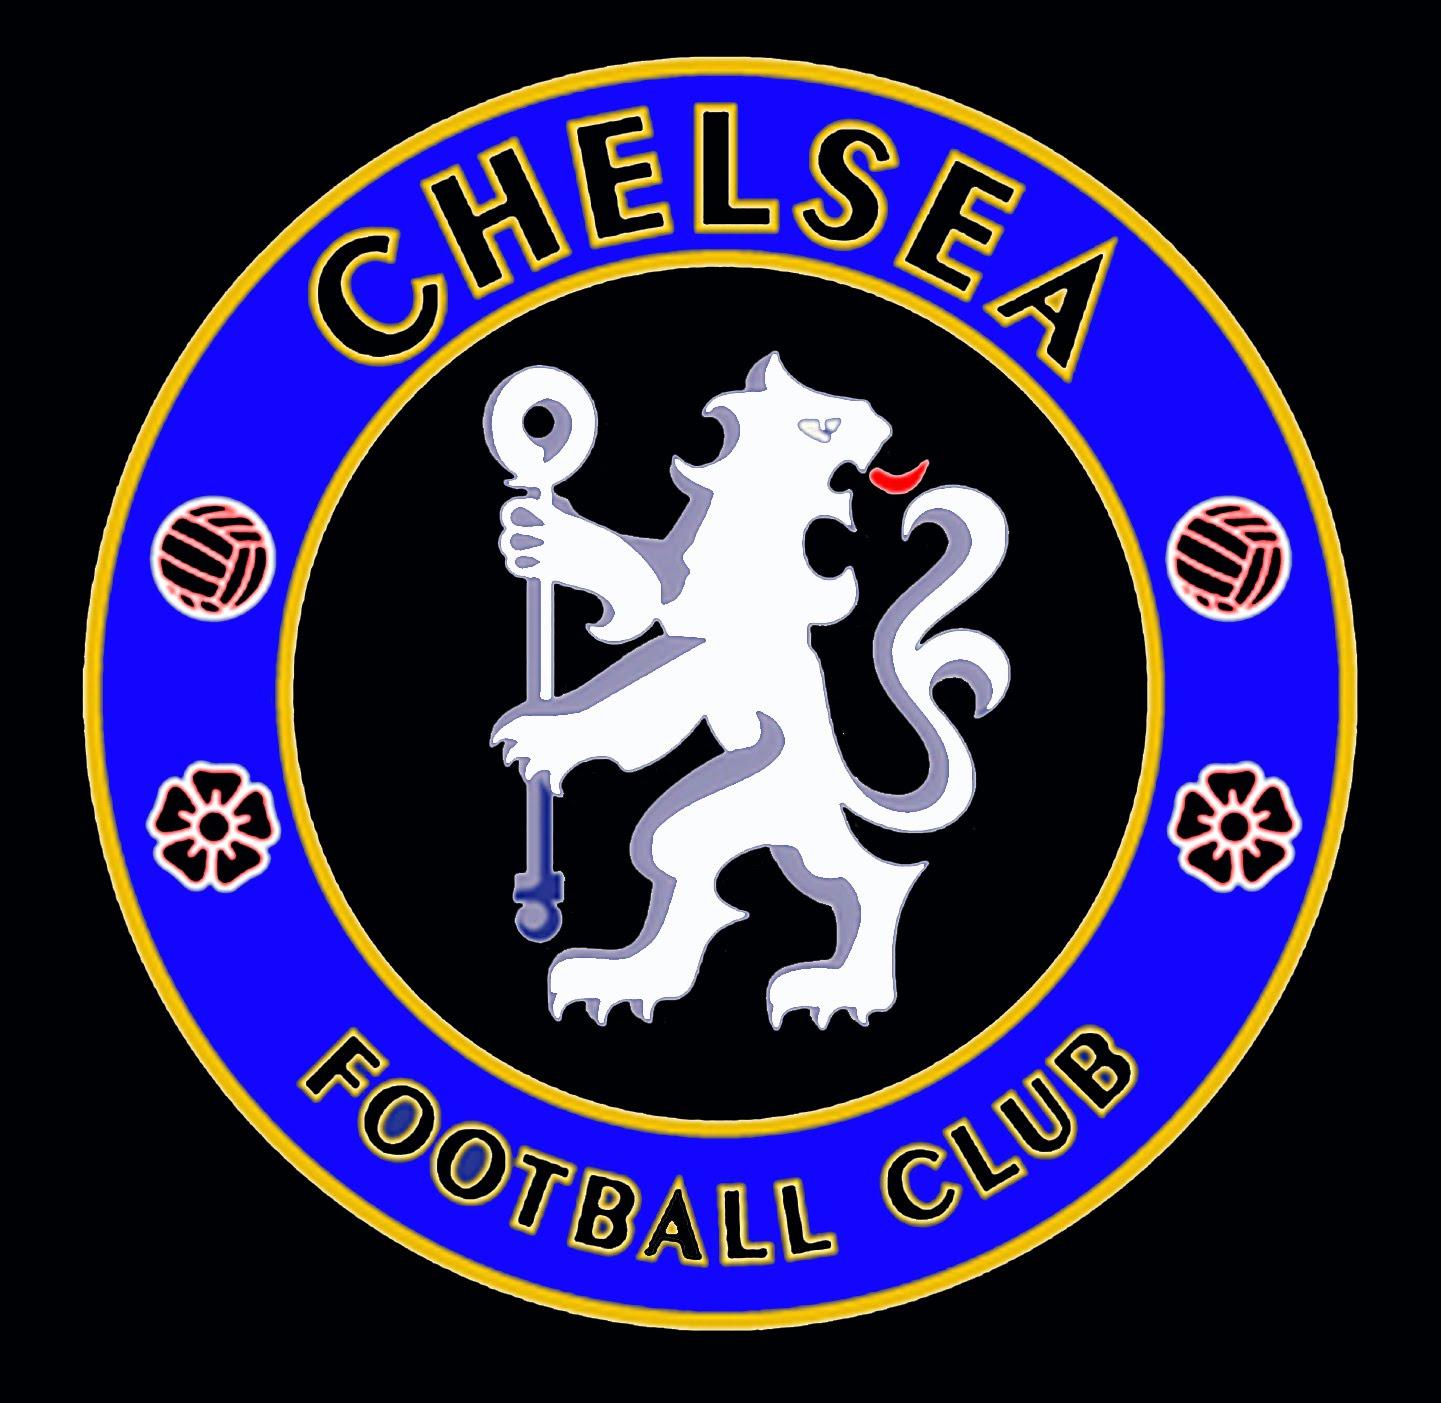 [75+] Chelsea Fc Logo Wallpaper on WallpaperSafari